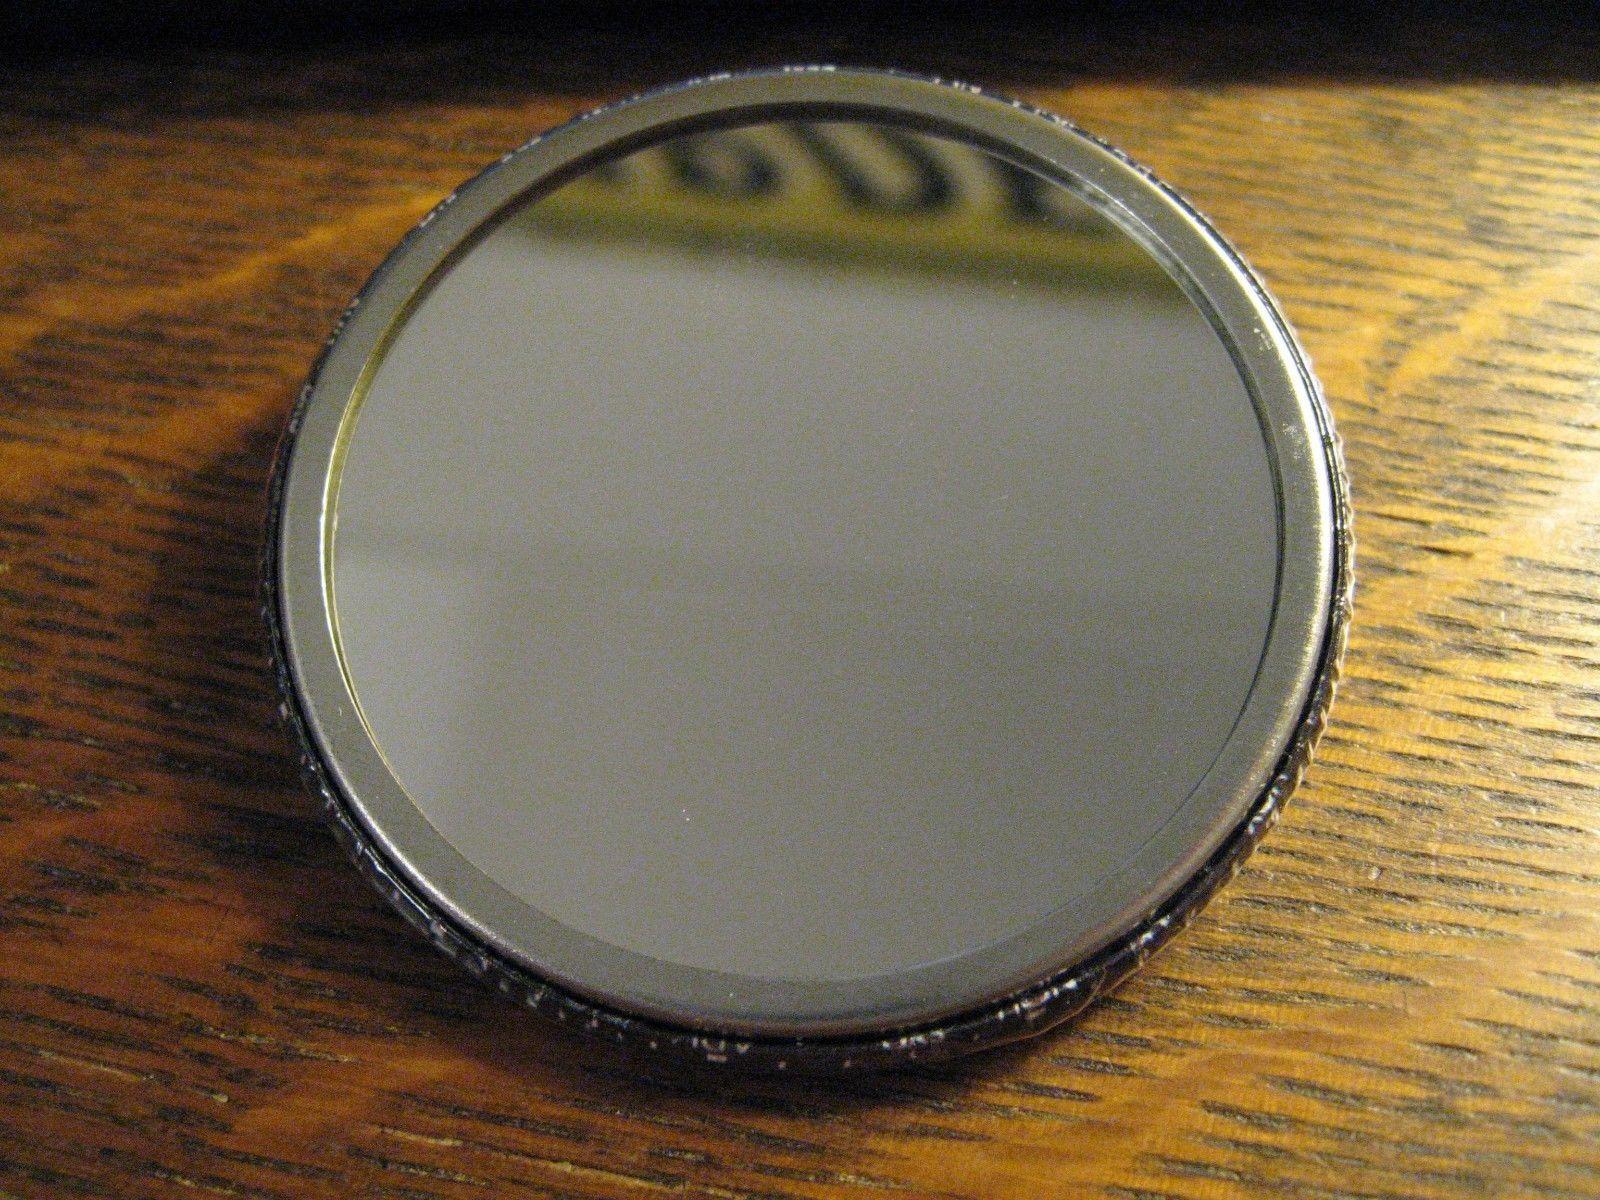 Citizen Eco Drive Pocket Mirror - Repurposed Watch Advertisement Lipstick Mirror